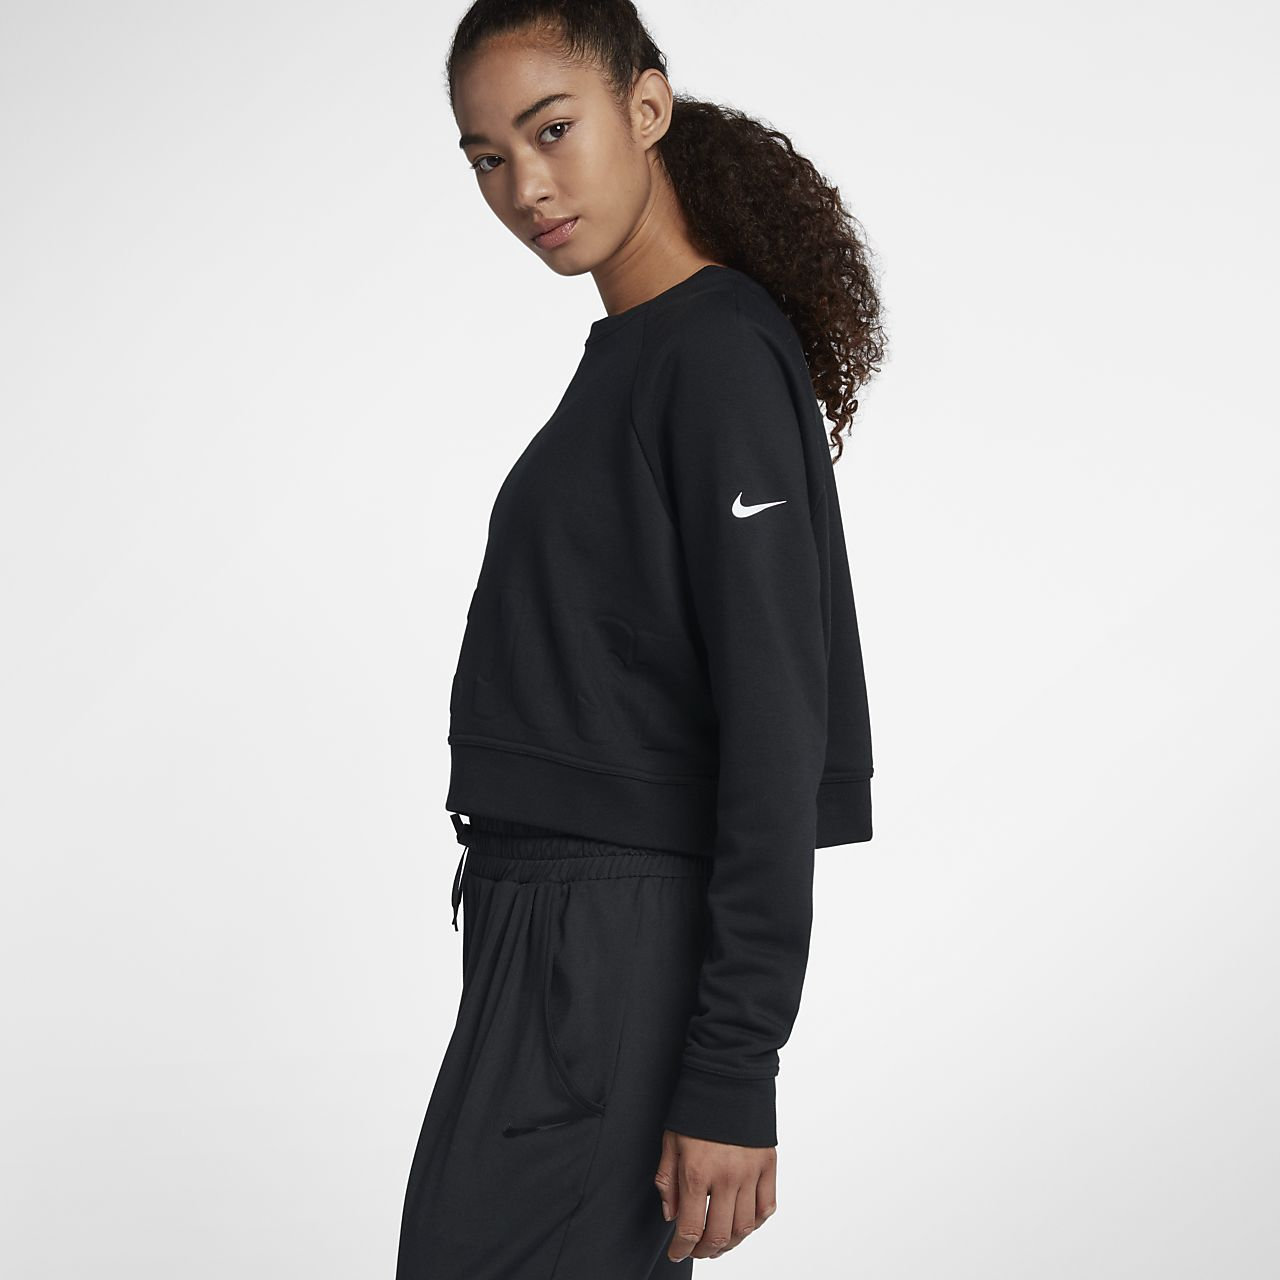 Nike WoHombres Long Sleeve Training Nl Nl Training ffecda